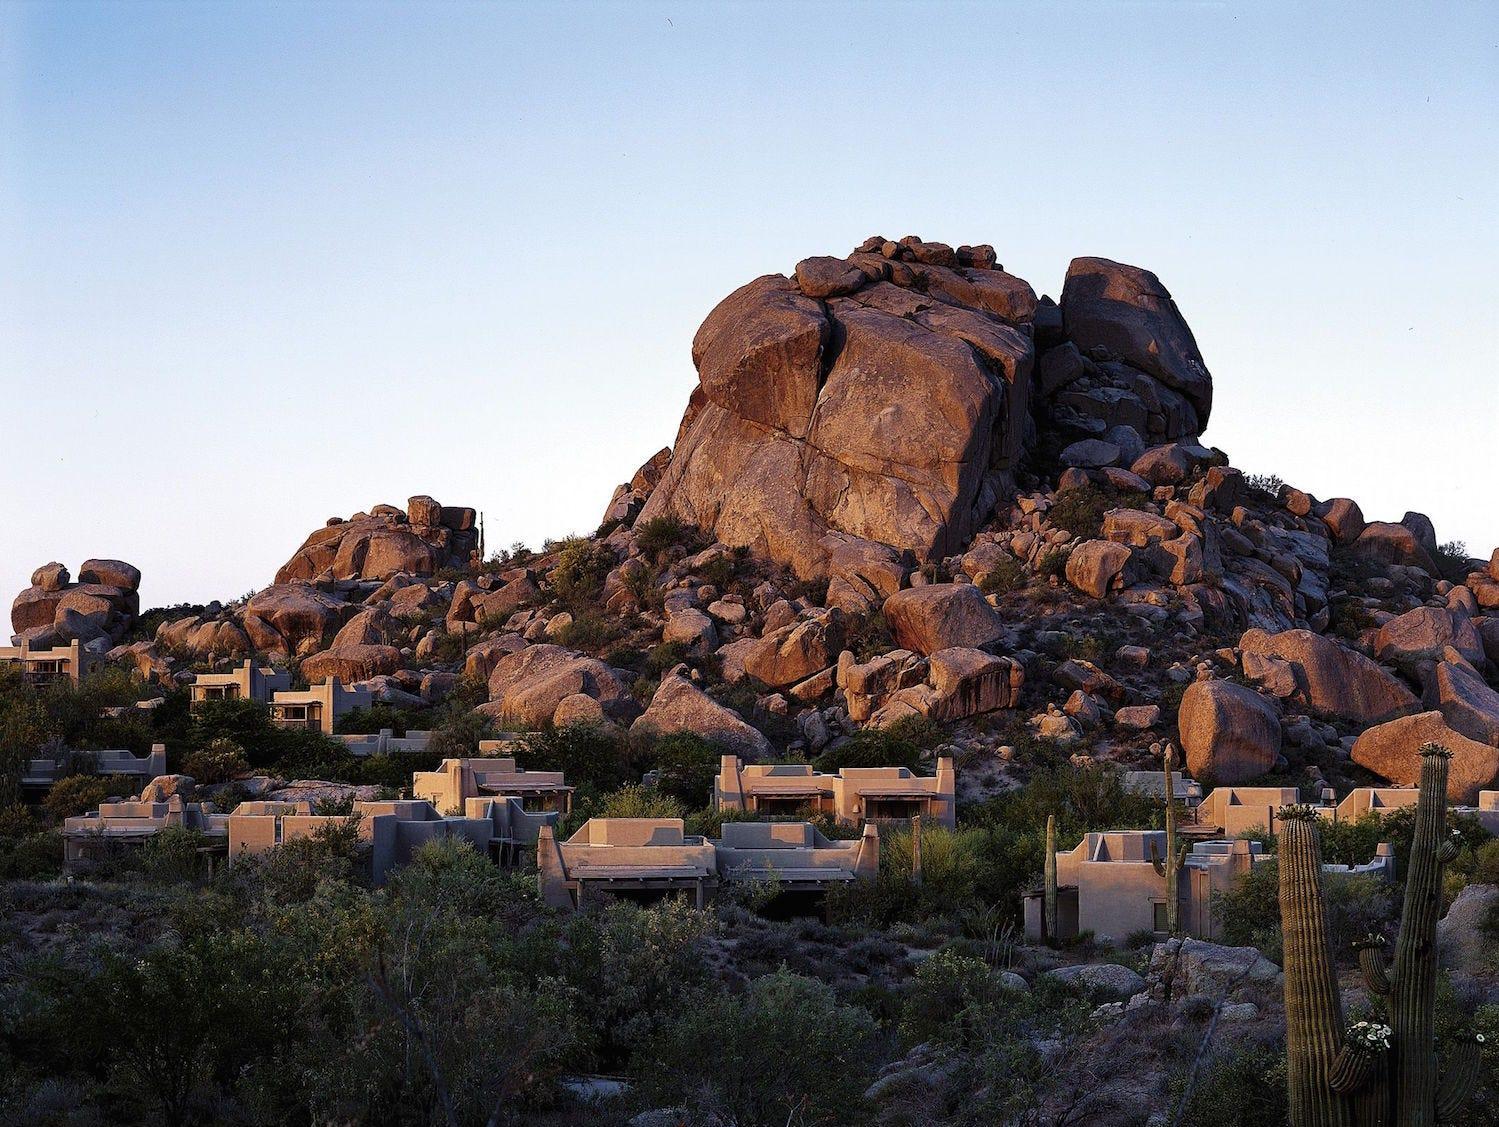 85255/north Scottsdale - $708,578